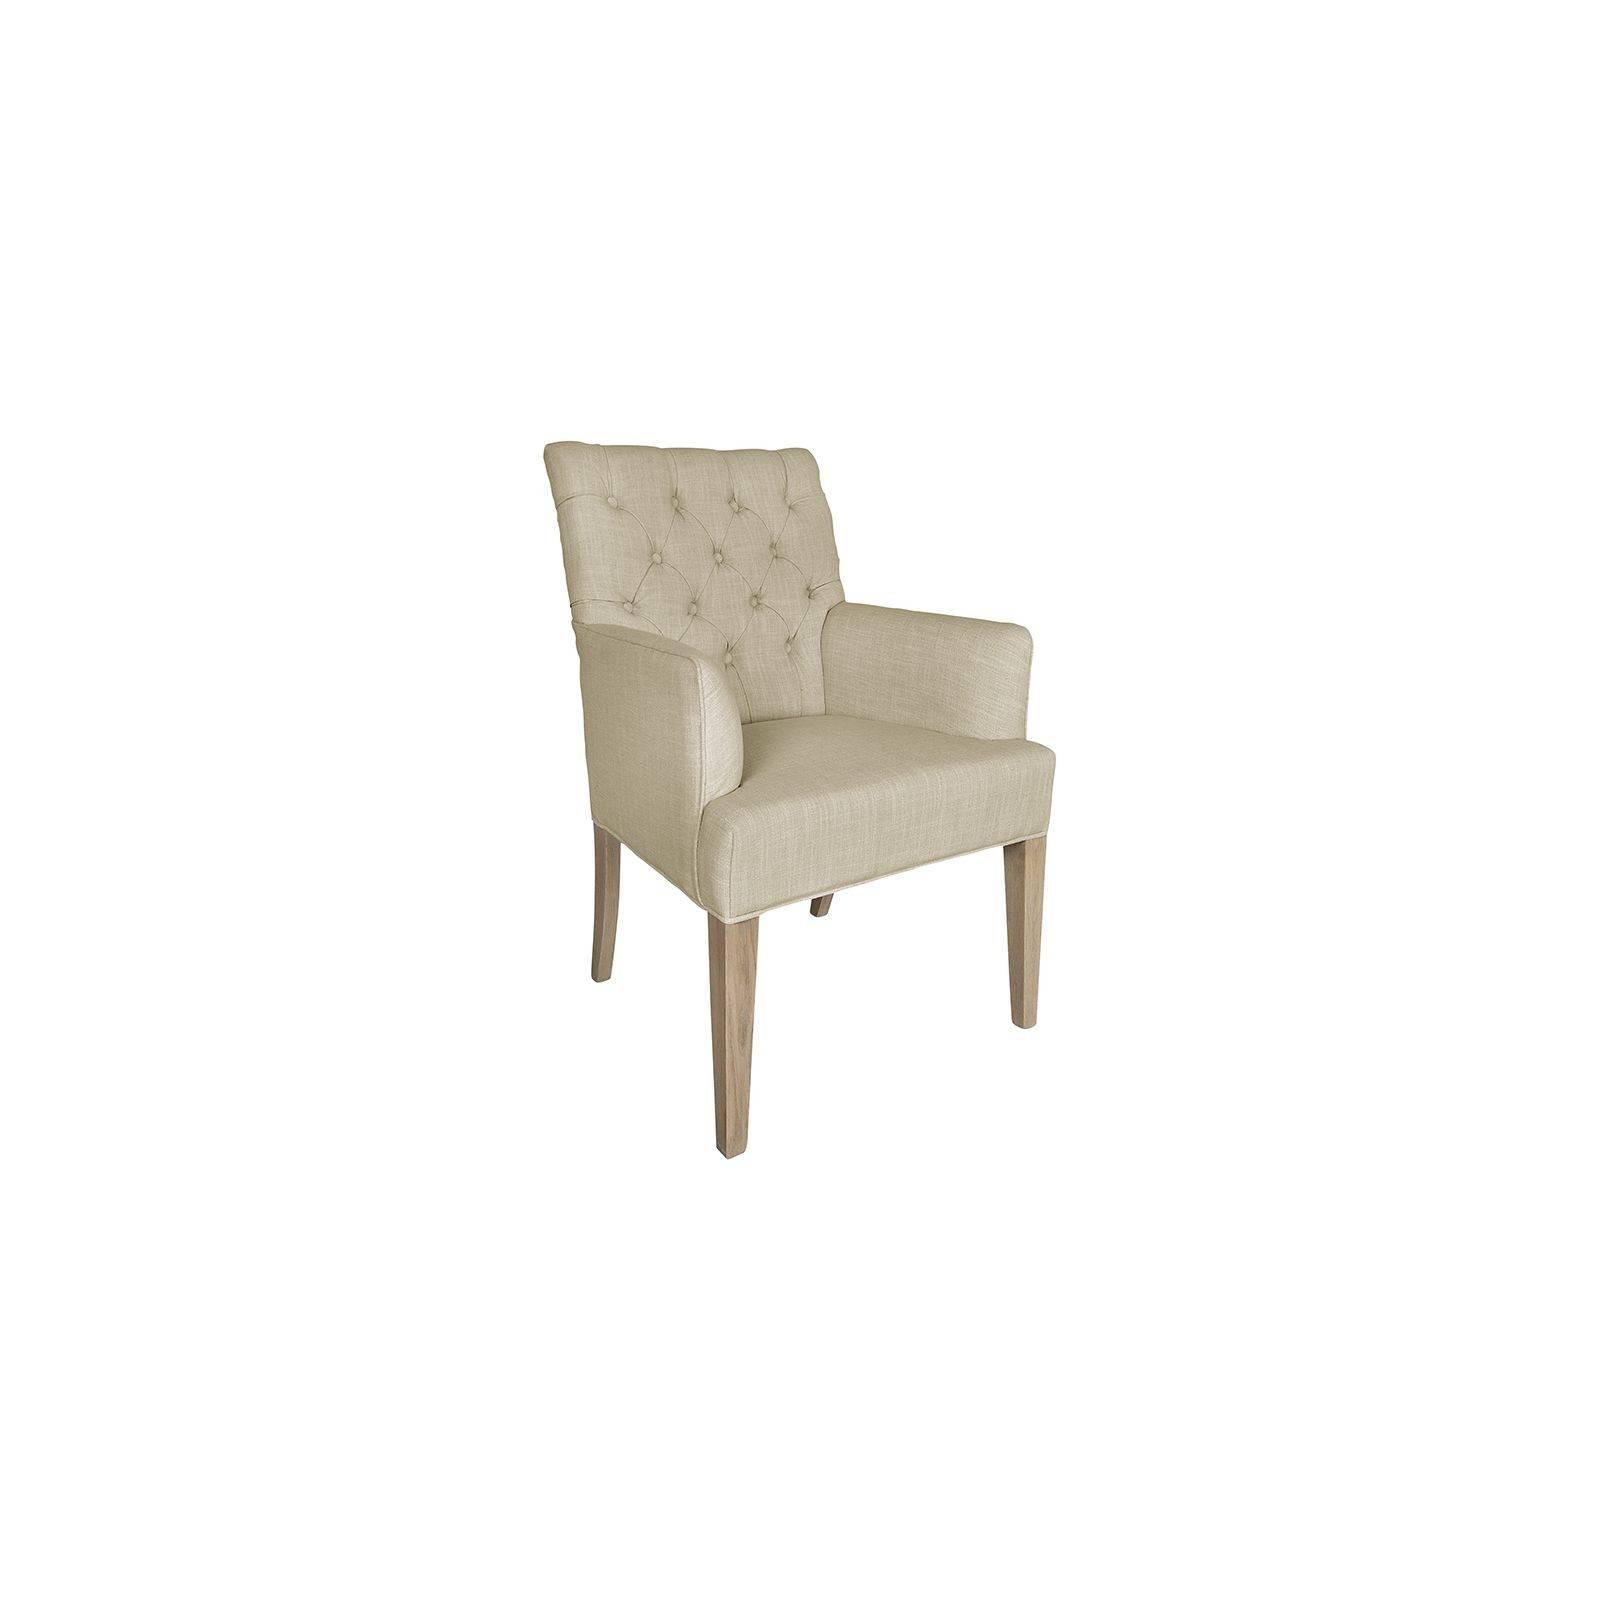 Chaise Romero Tissu - Achat meubles style classique